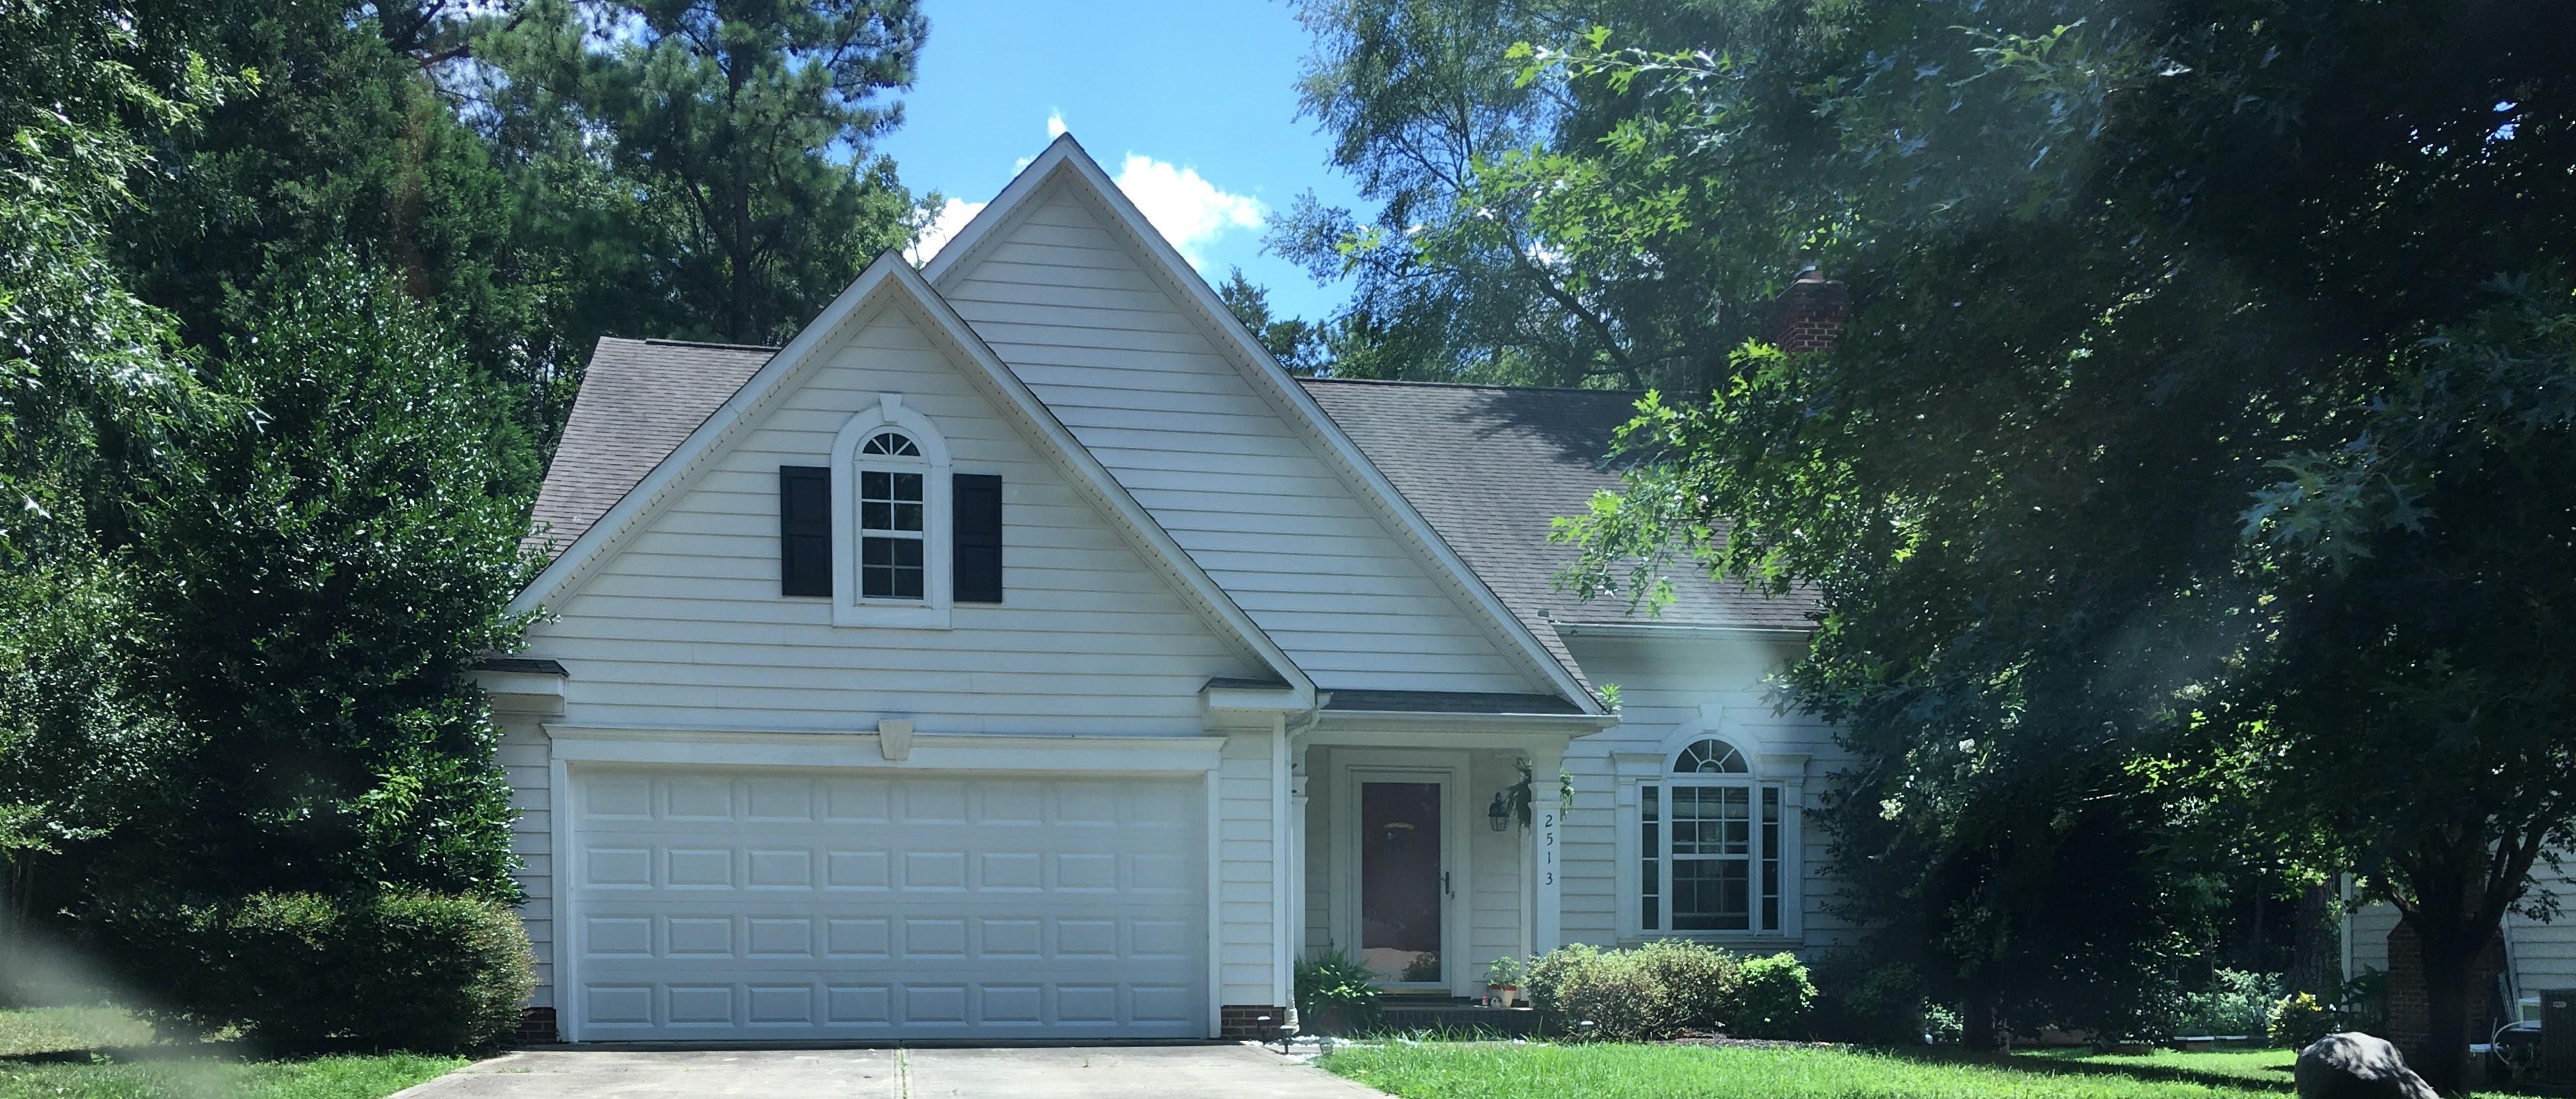 Steel Creek House in Charlotte North Carolina